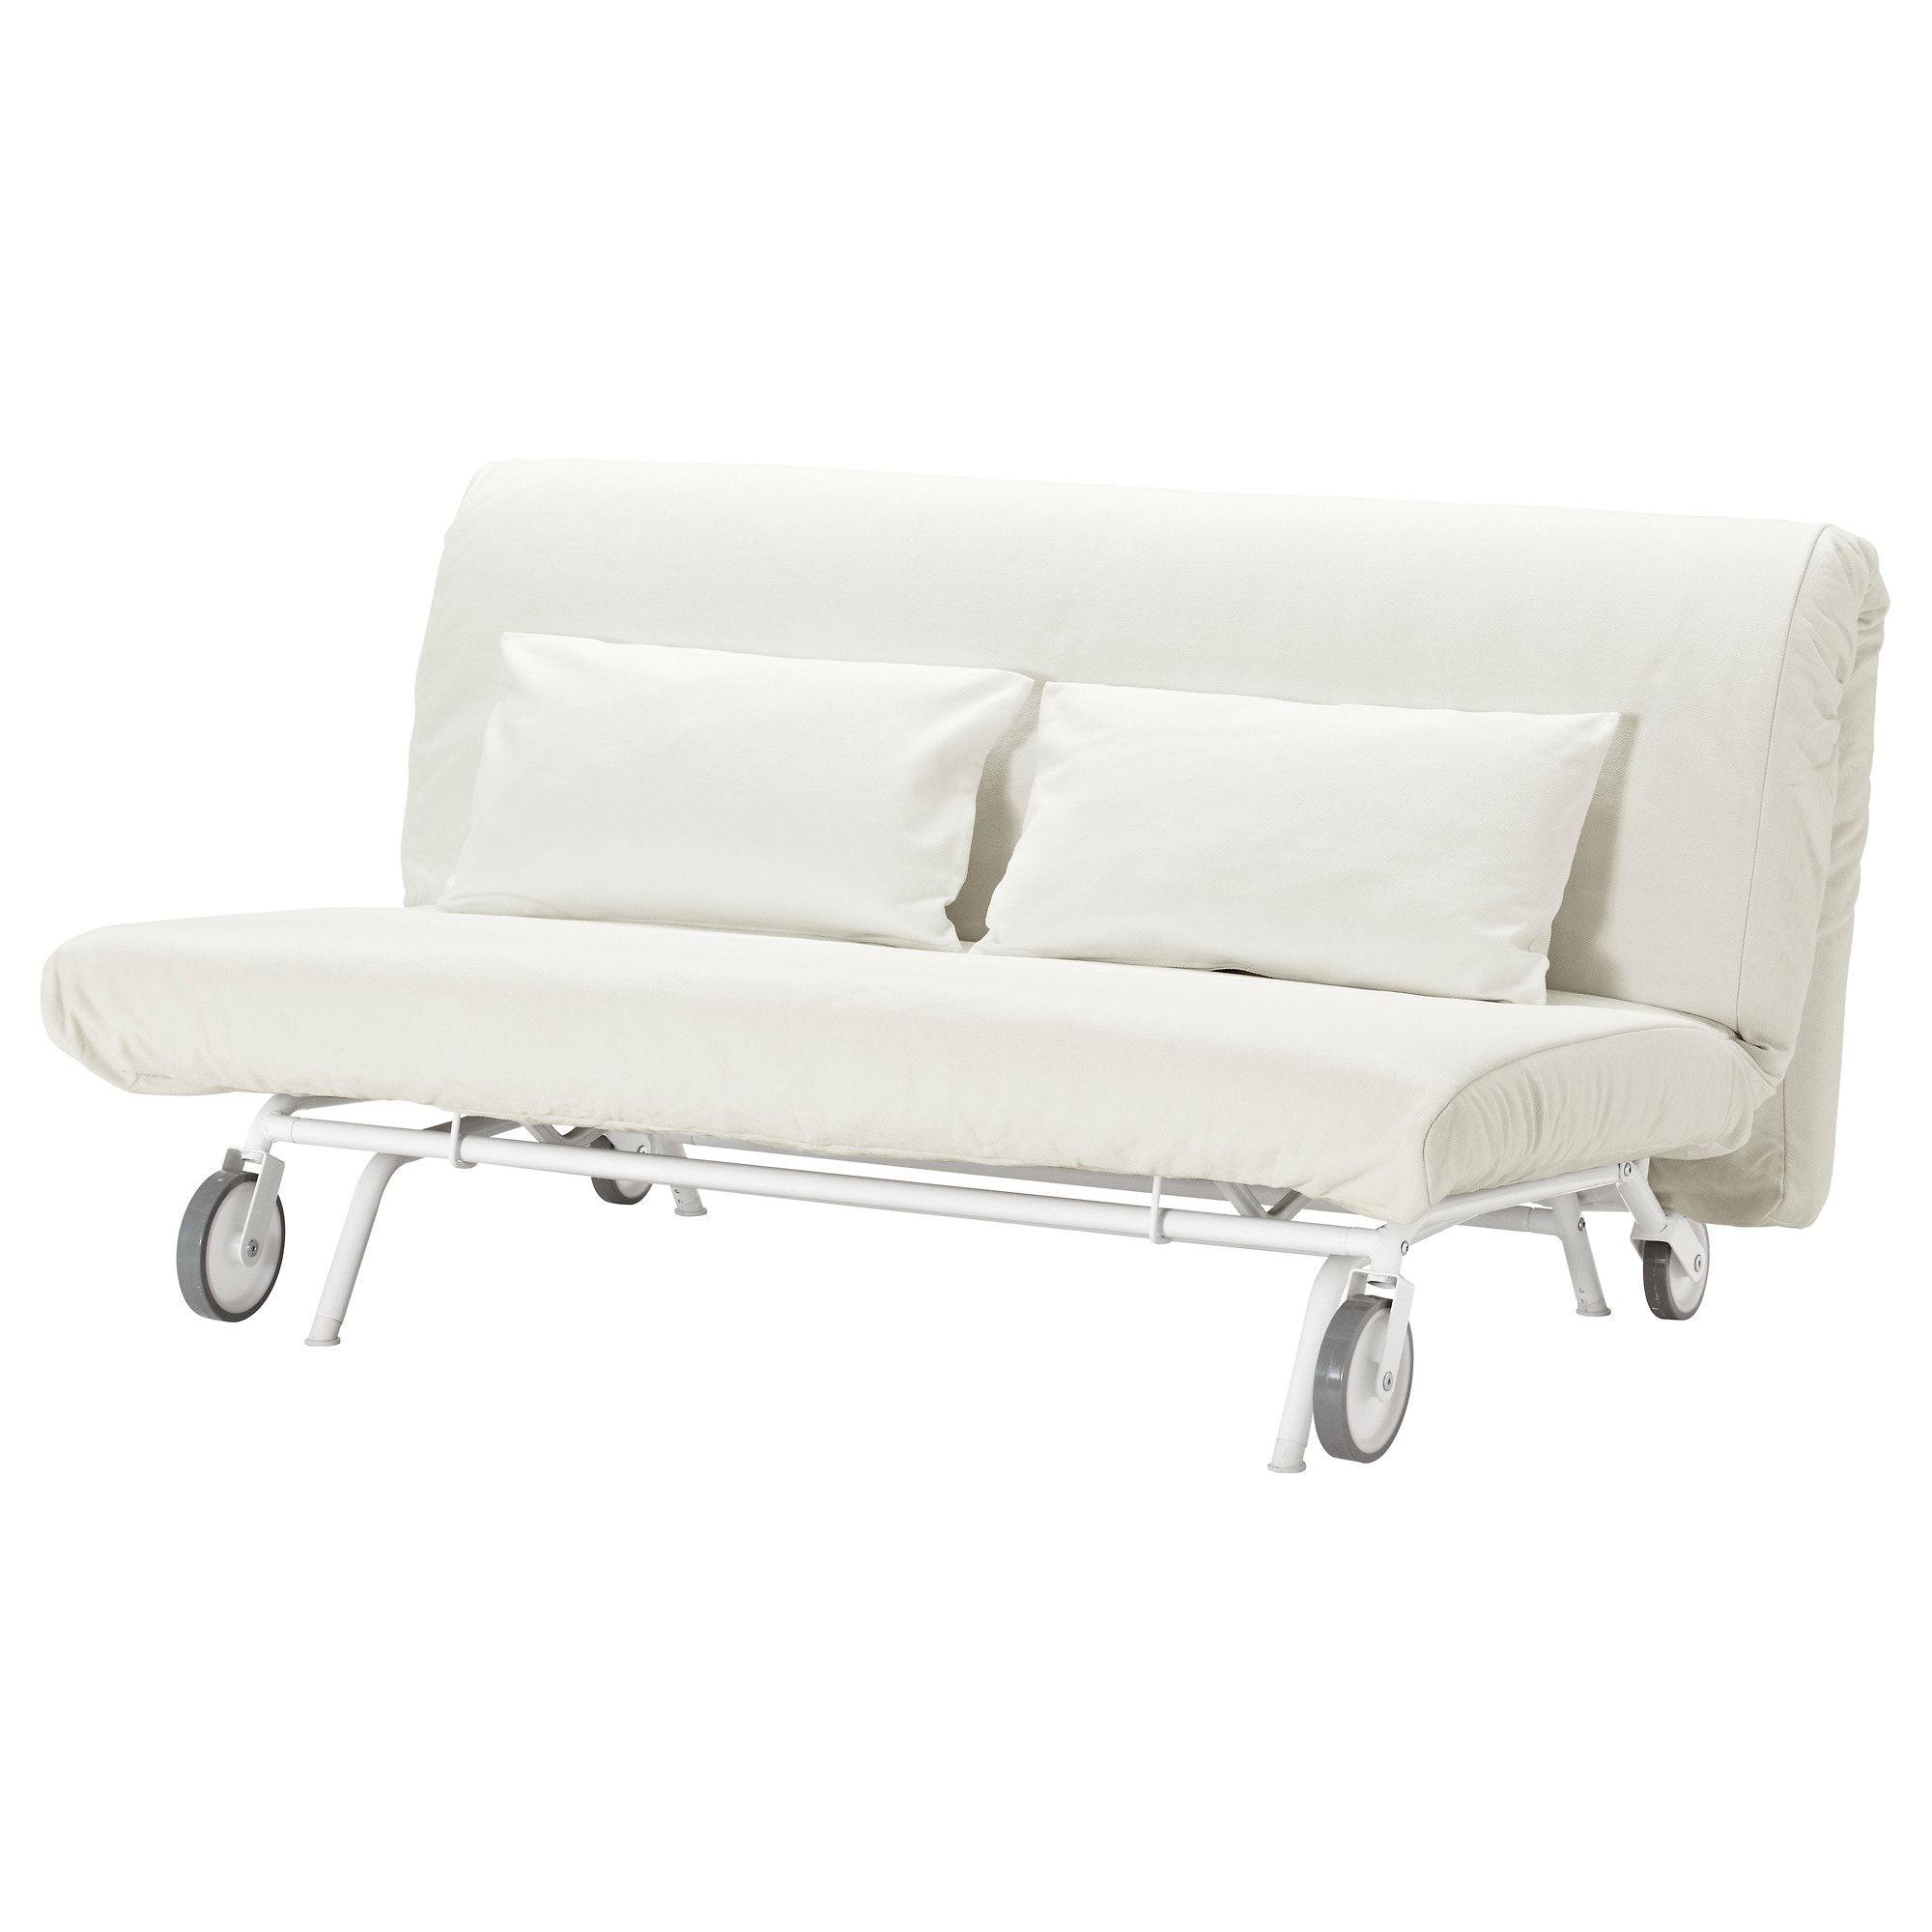 Ikea Us Furniture And Home Furnishings Ikea Sofa Bed Sleeper Sofa Ikea Leather Sofa Bed